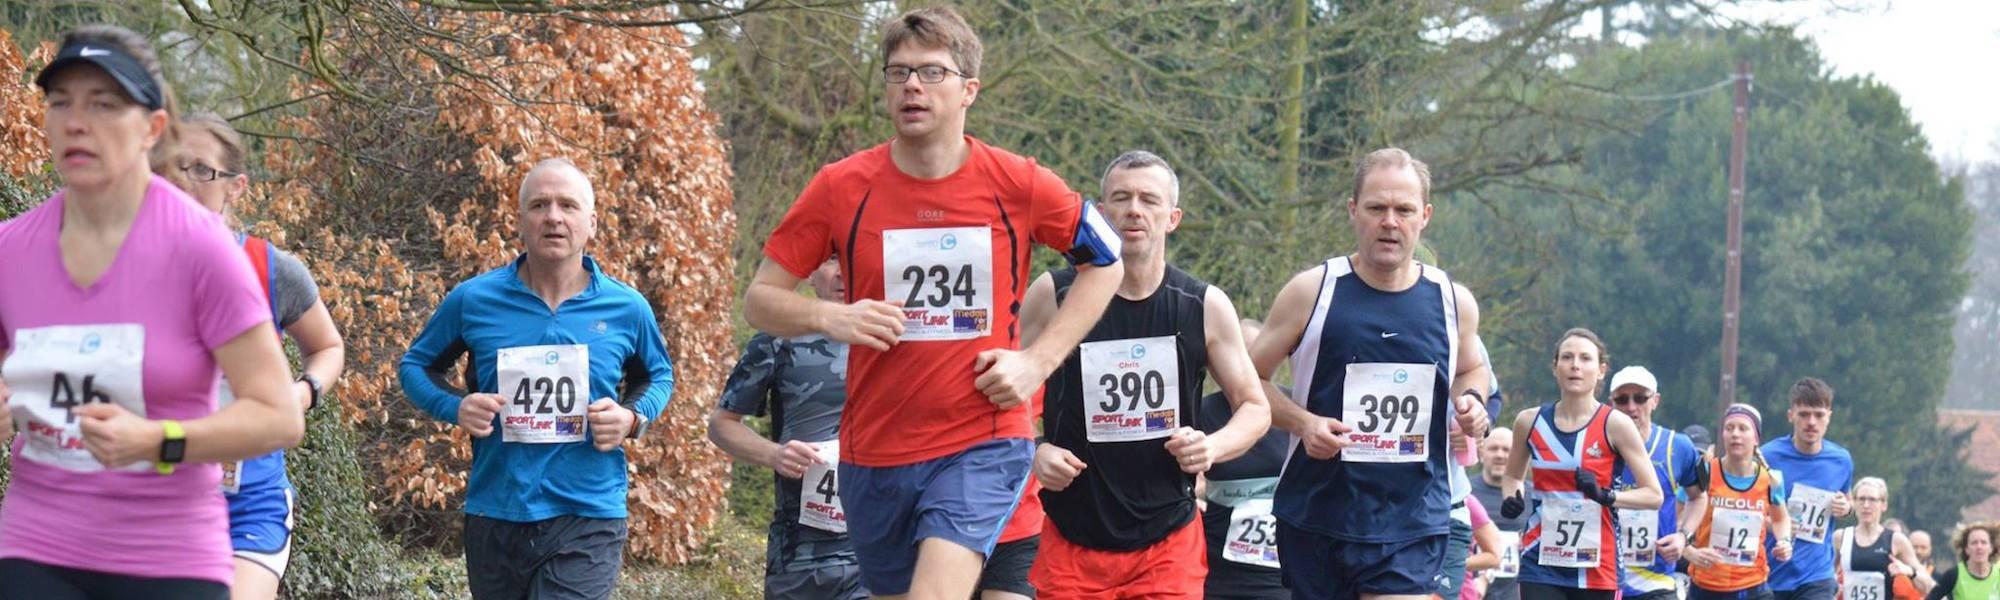 Broadland Half Marathon - cover image